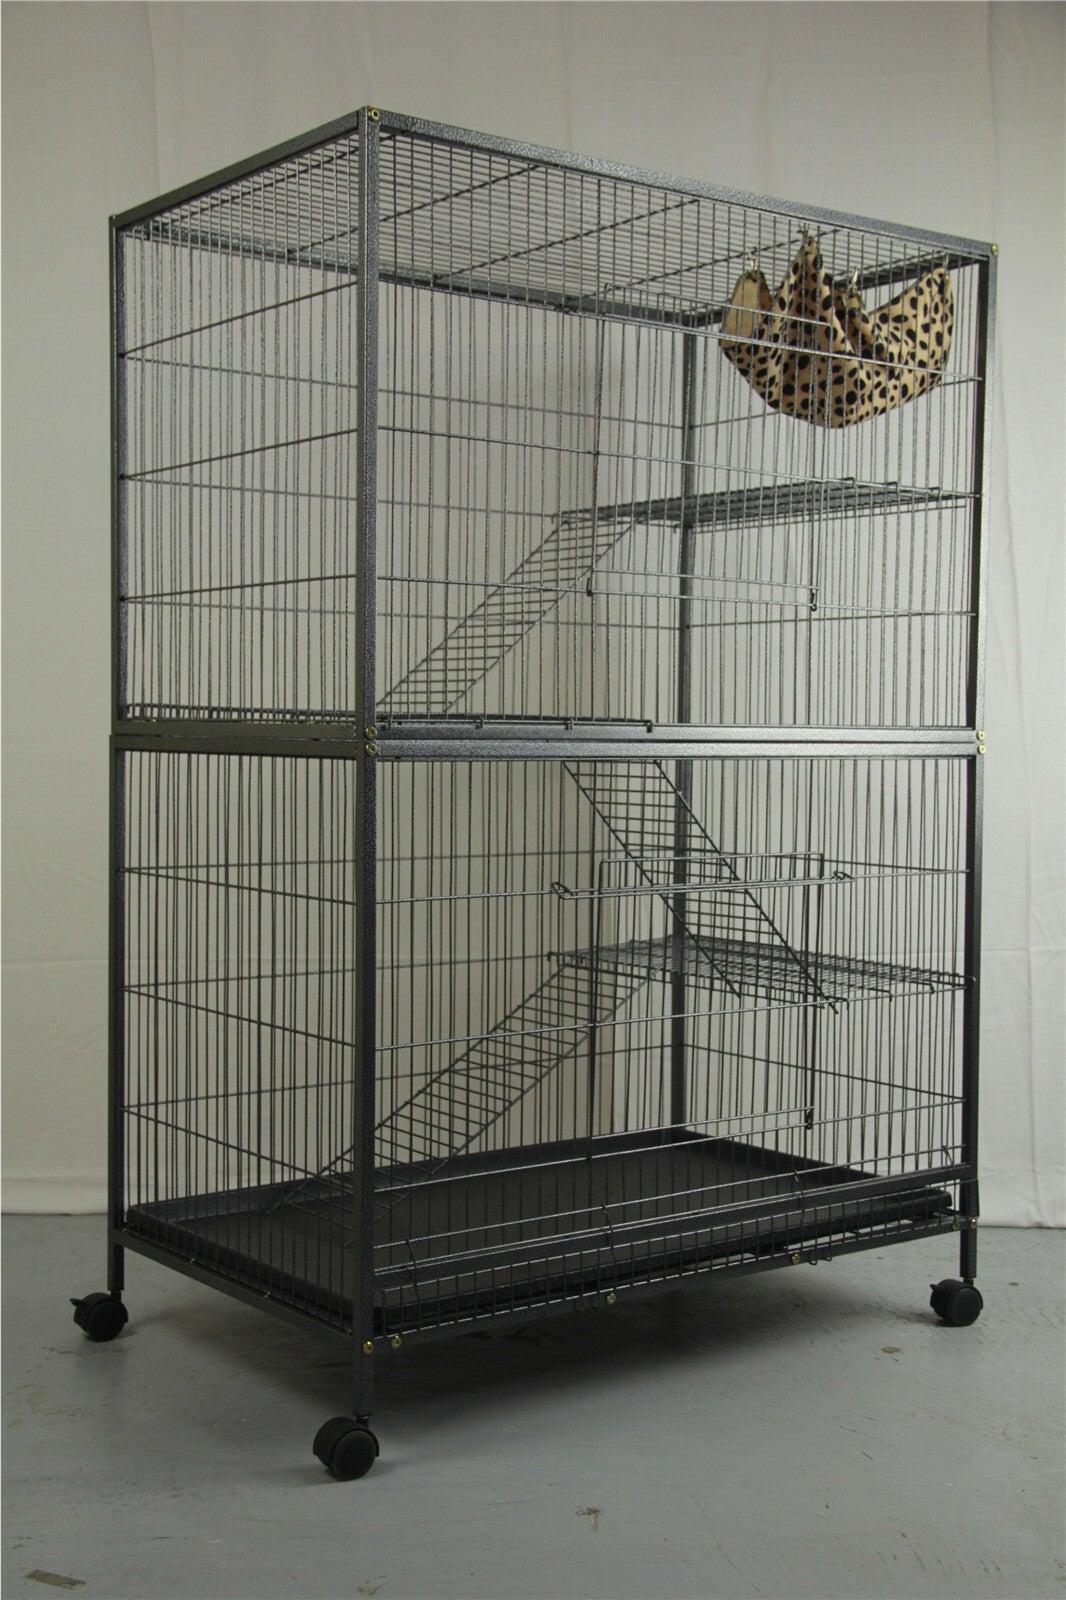 Pet 140cm 4 Level Bird Ferret Parrot Cage Aviary Cat Budgie Hamster Castor